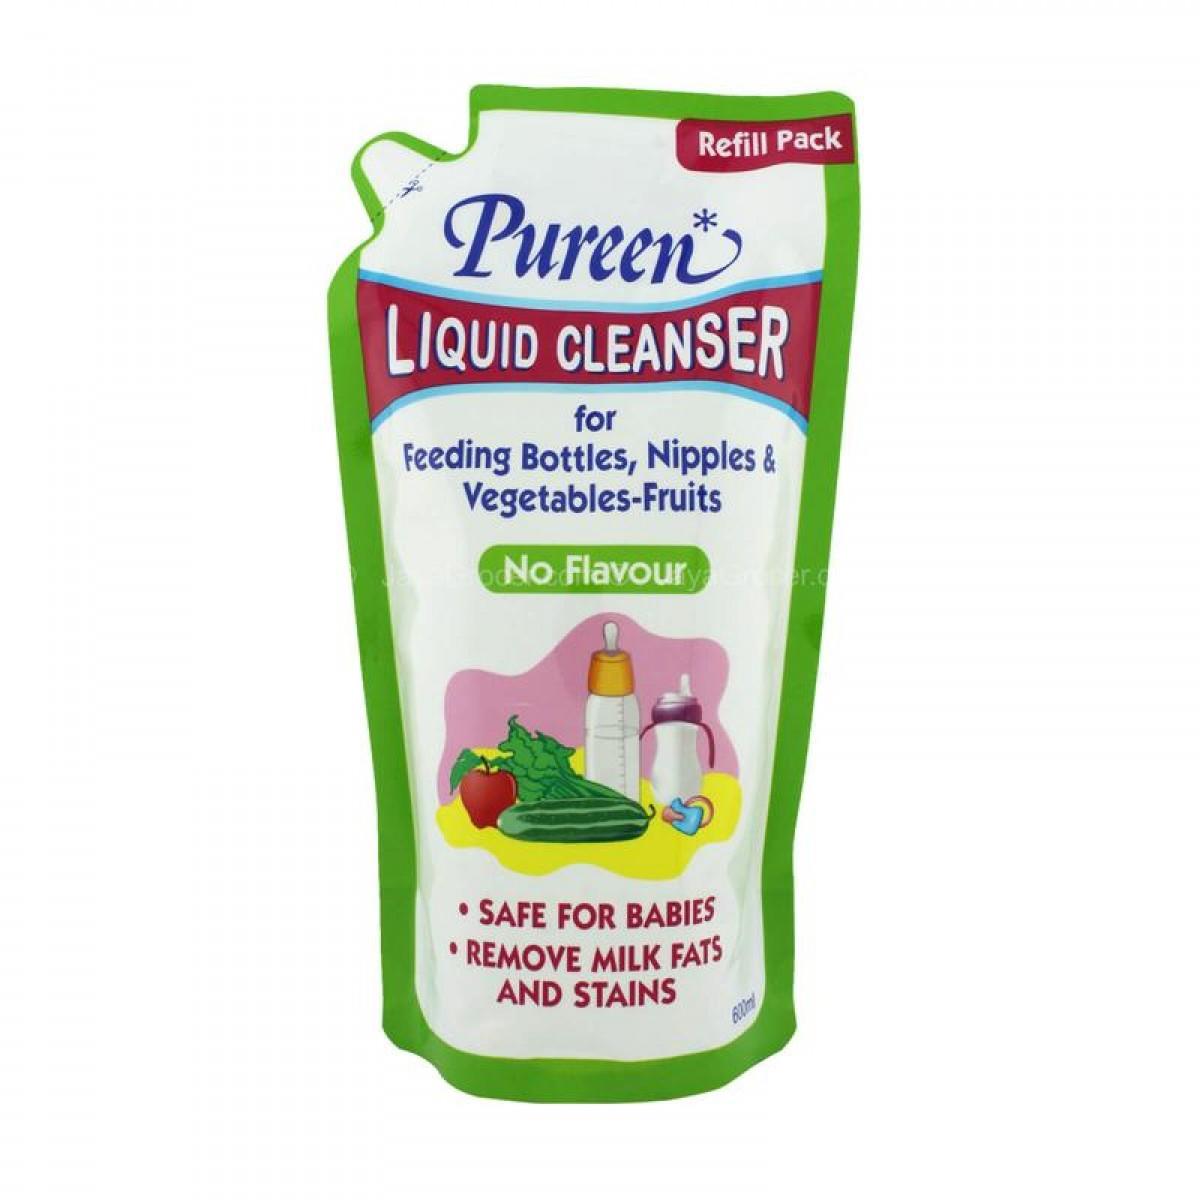 Pureen Liquid Cleanser Refill No Flavour (600ml) - Kico Baby Center